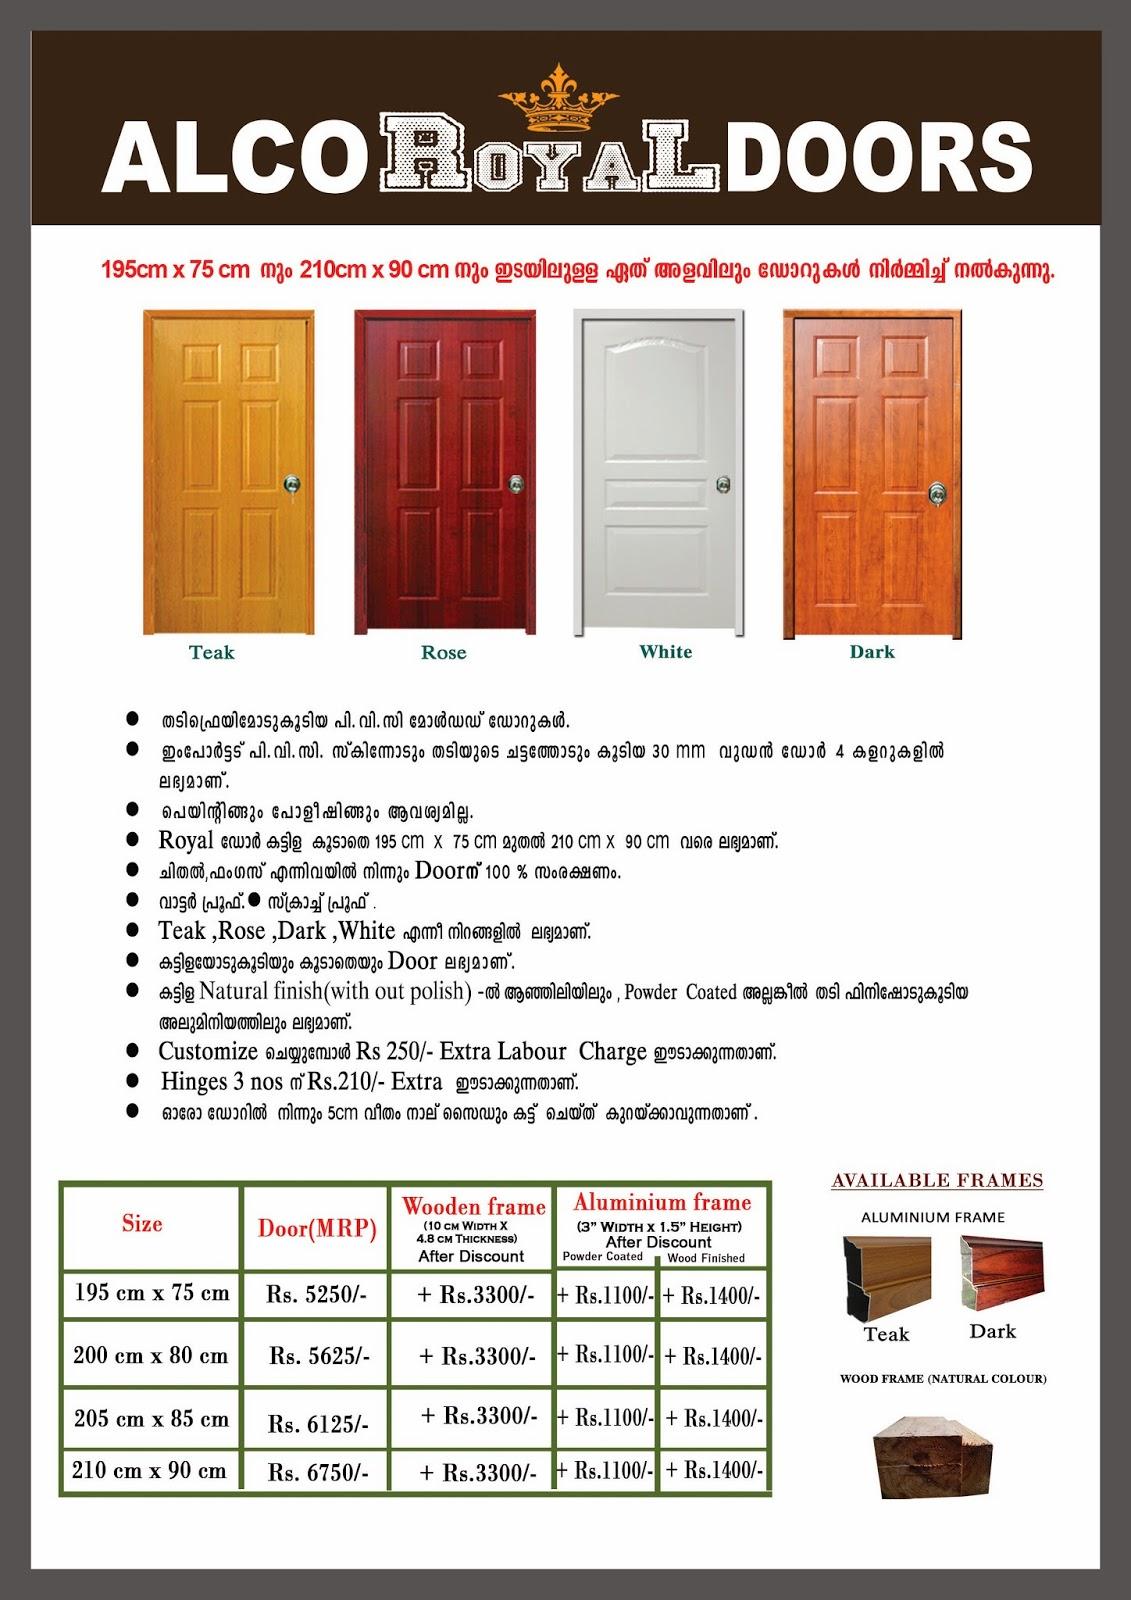 Alco Aluminium Pvc Branded Products Current Alco Pvc Glass Door Rates